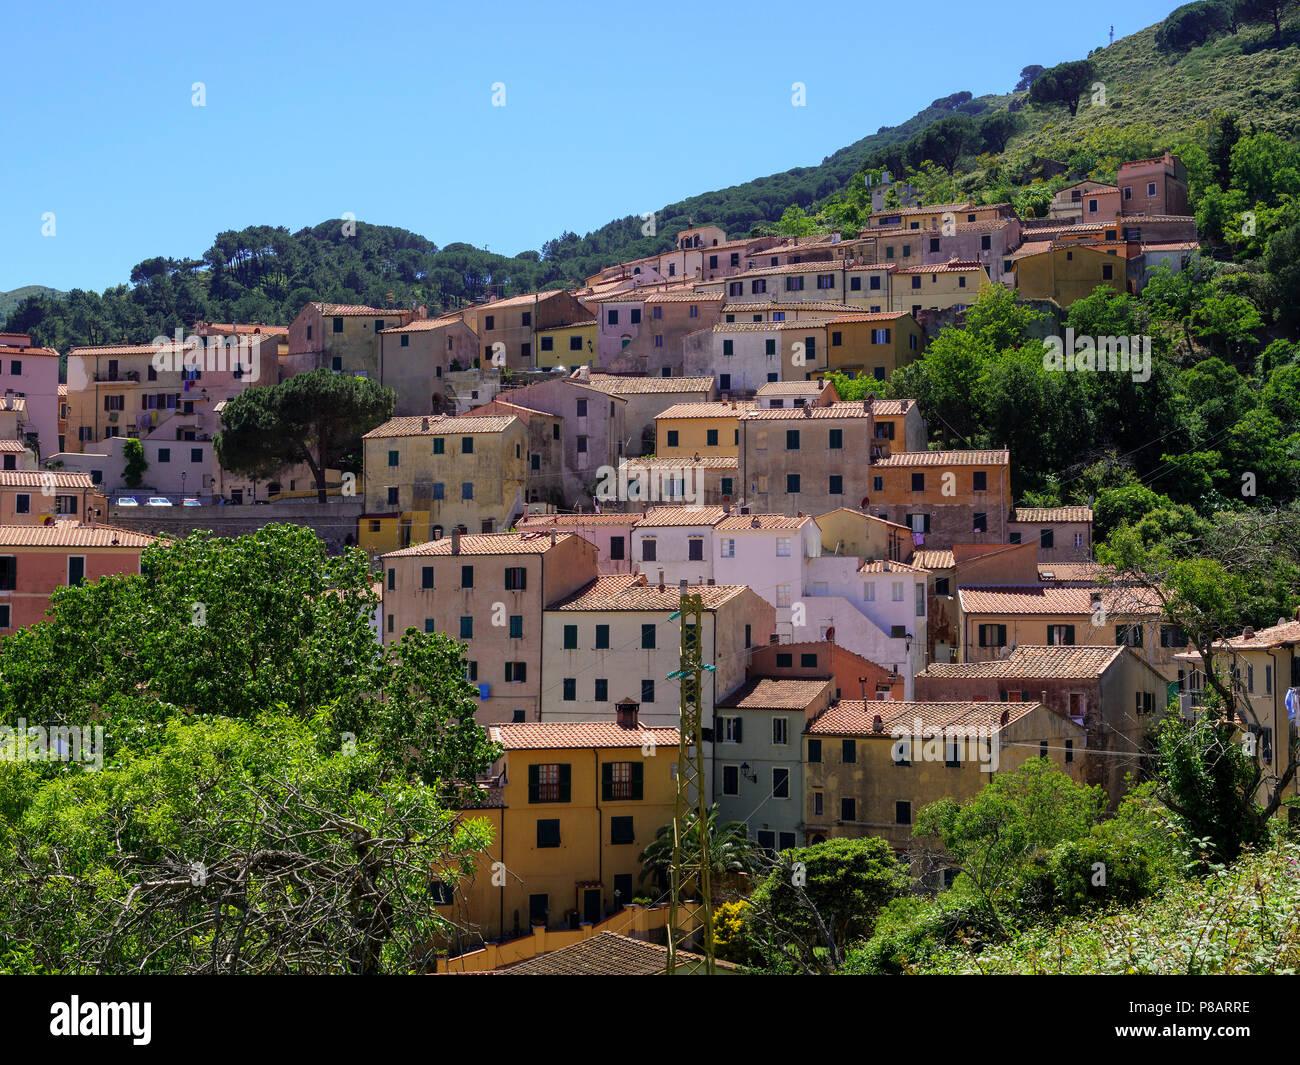 Blick auf Rio nell' Elba, Elba, Region Toskana, Provinz Livorno, Italien, Europa Rio nell' Elba, Elba, Region Tuscany, Province Livorno, Italy, Europe - Stock Image